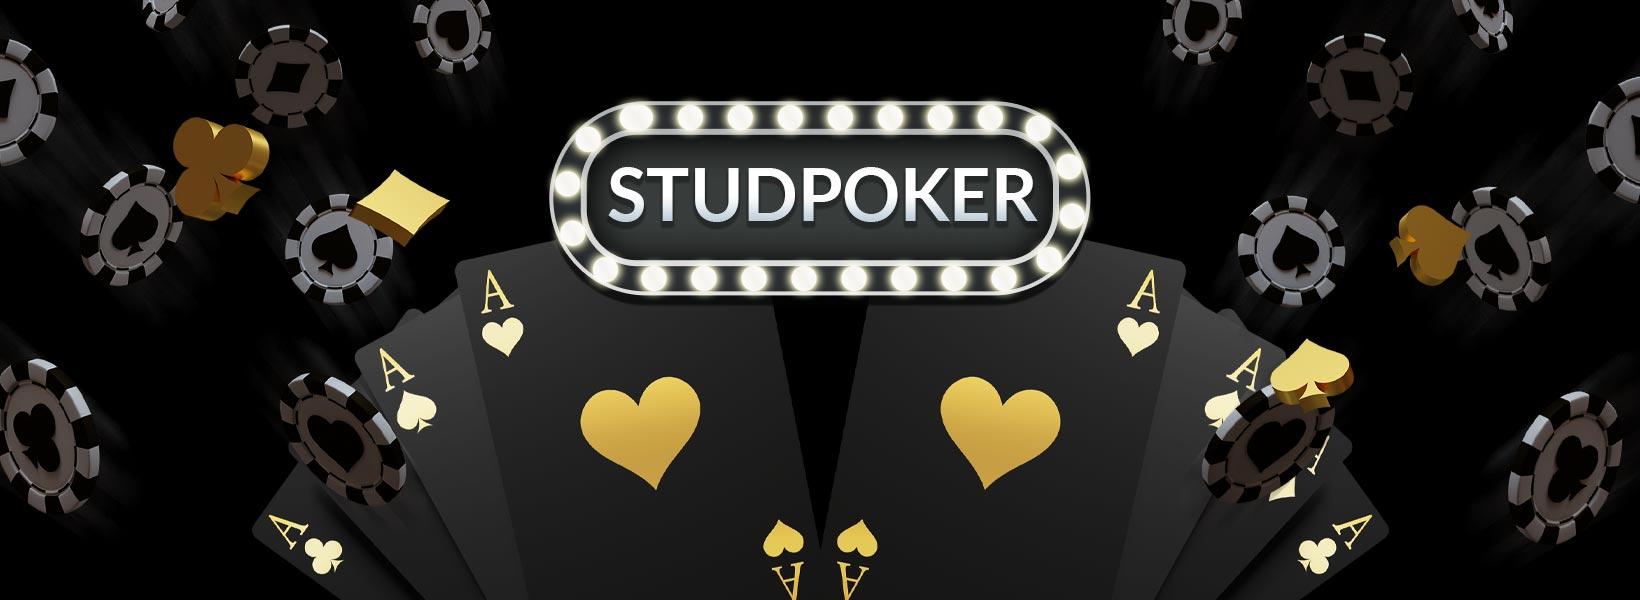 stud poker reguli